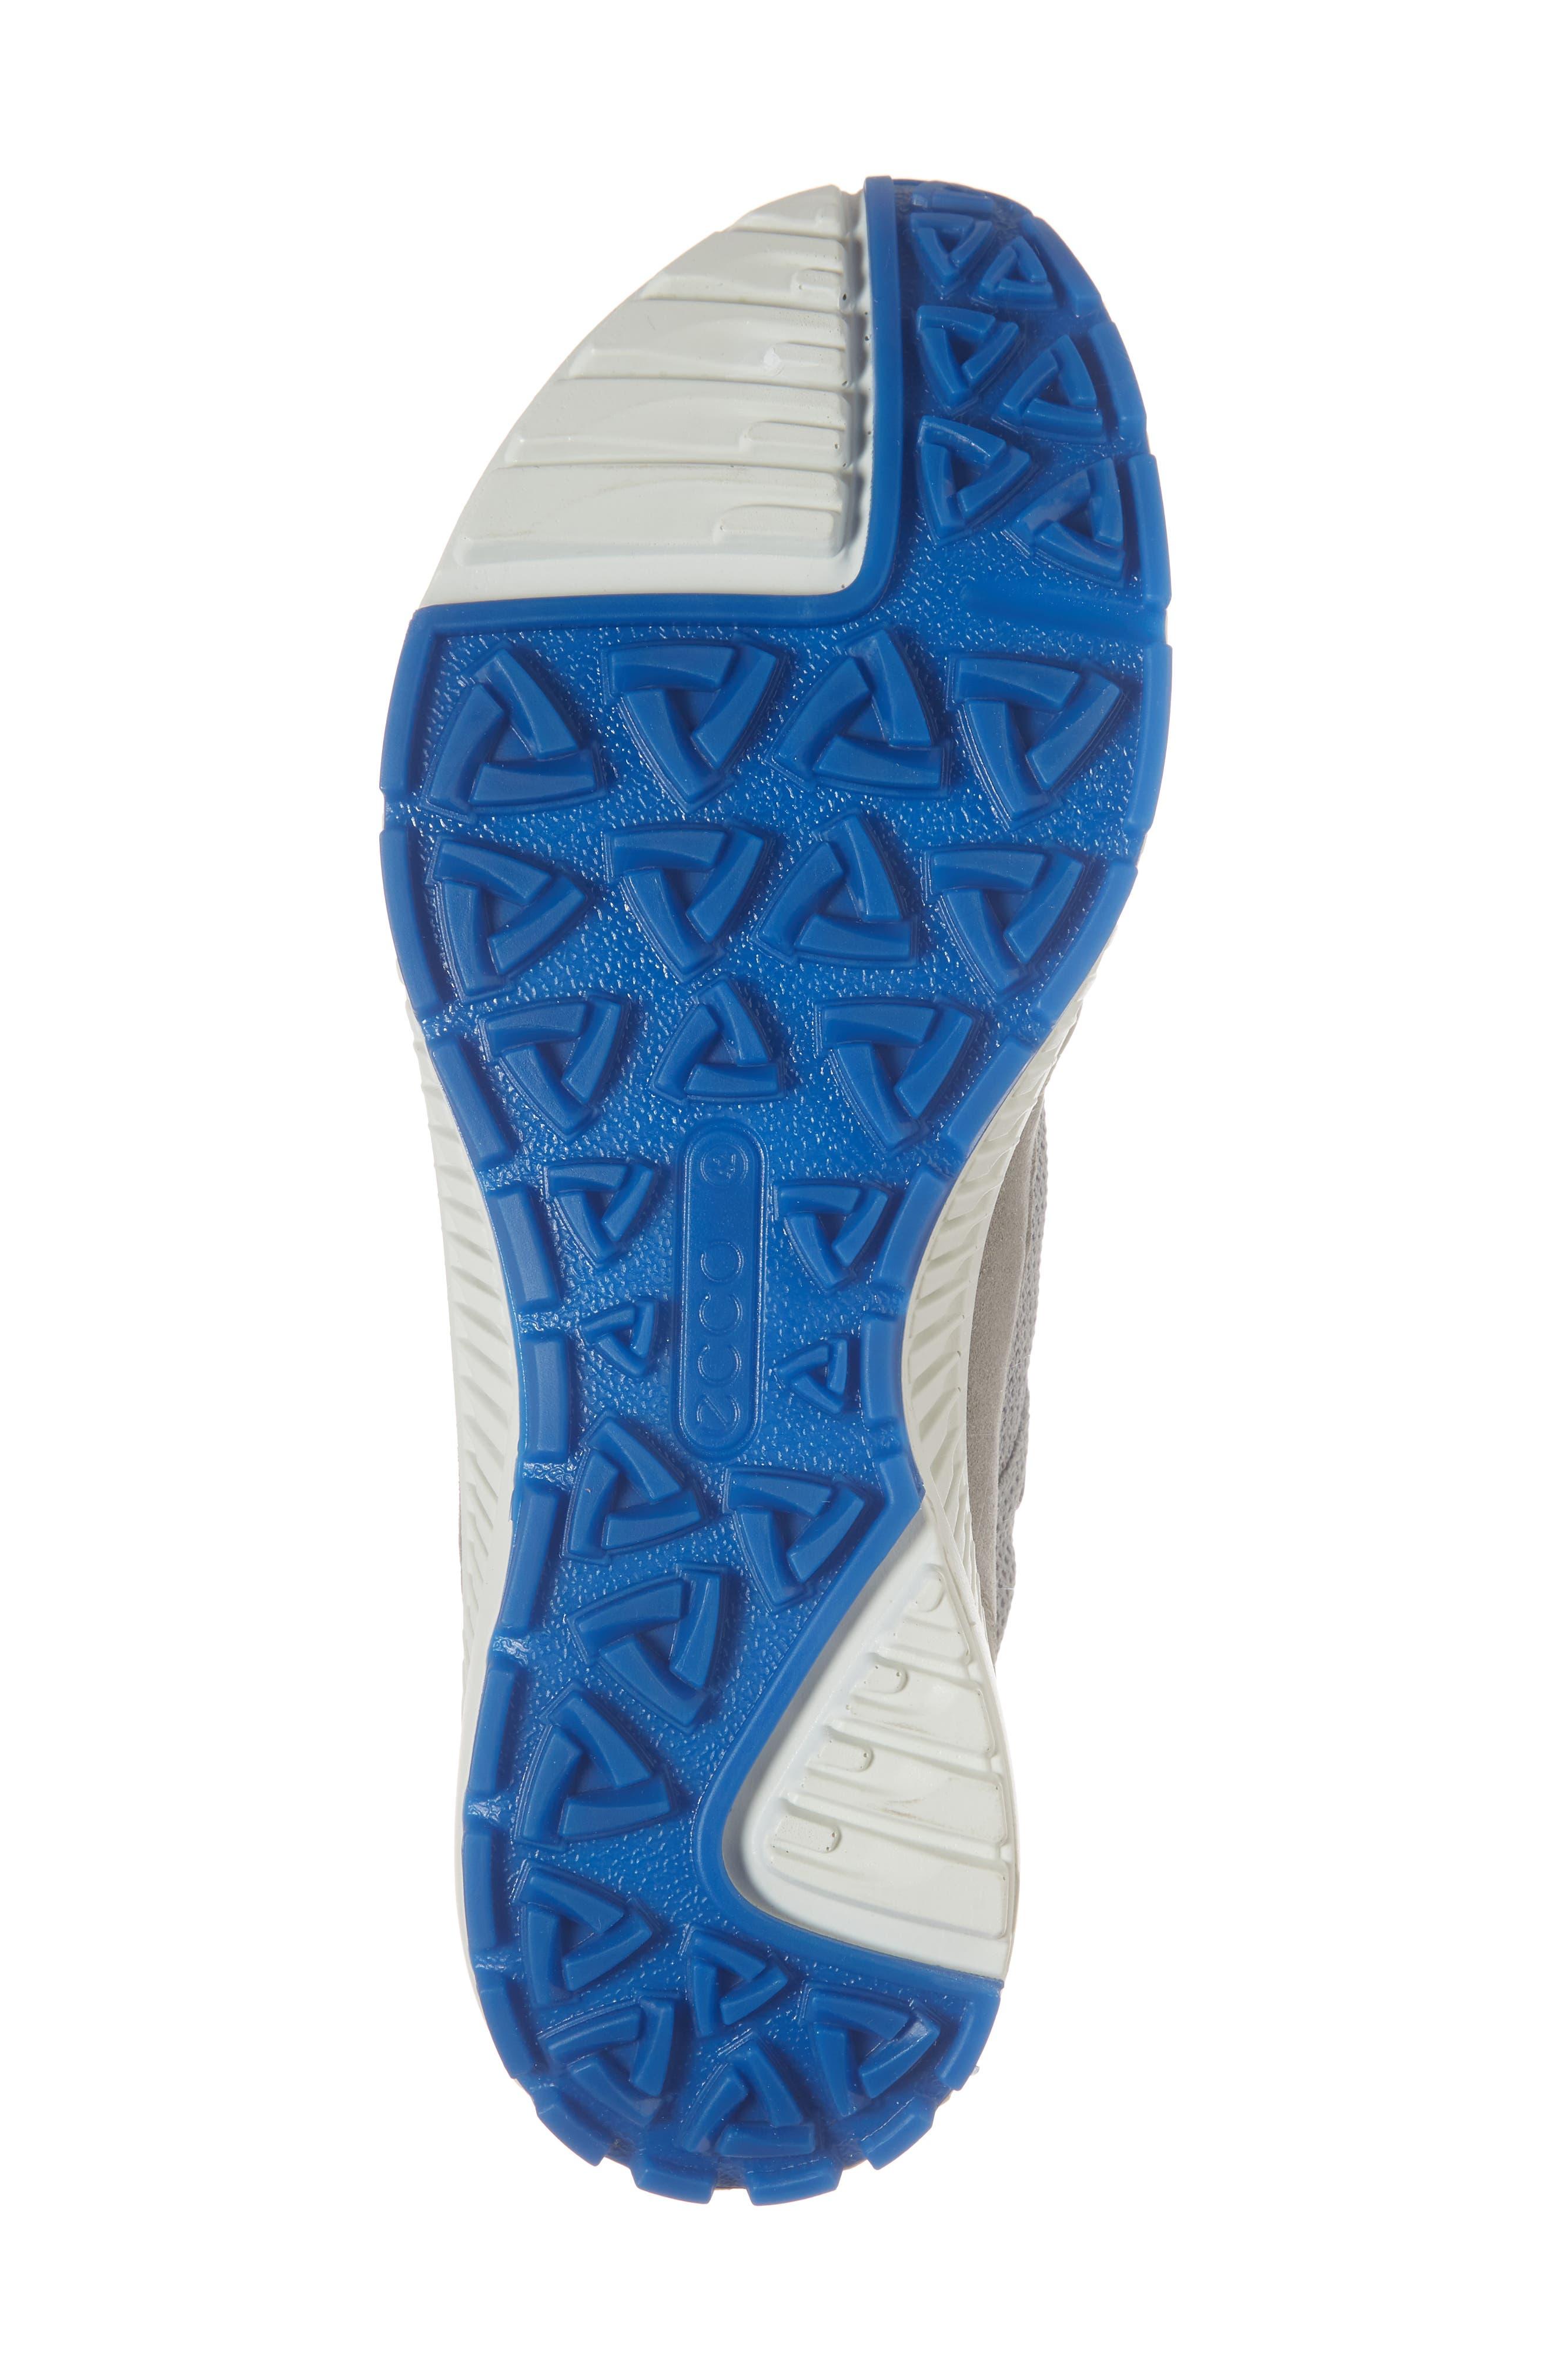 Terracruise II Sneaker,                             Alternate thumbnail 6, color,                             Wild Dove Leather